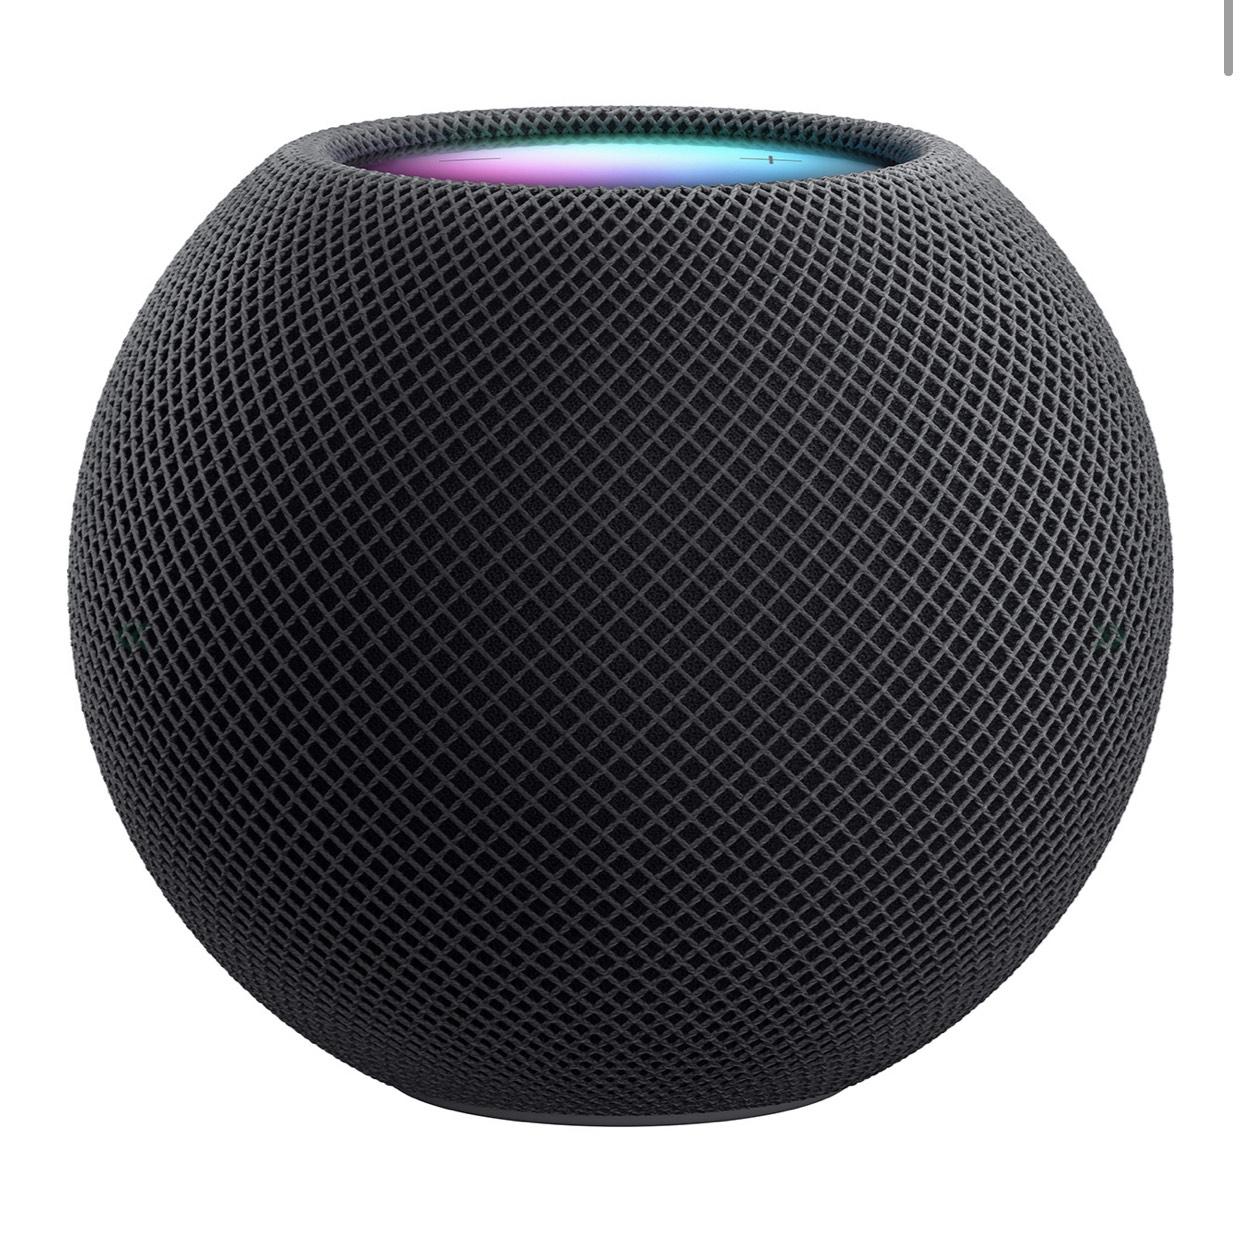 Apple HomePod Mini with Siri – Space Grey - £75 @ ElekDirect (AO Outlet)